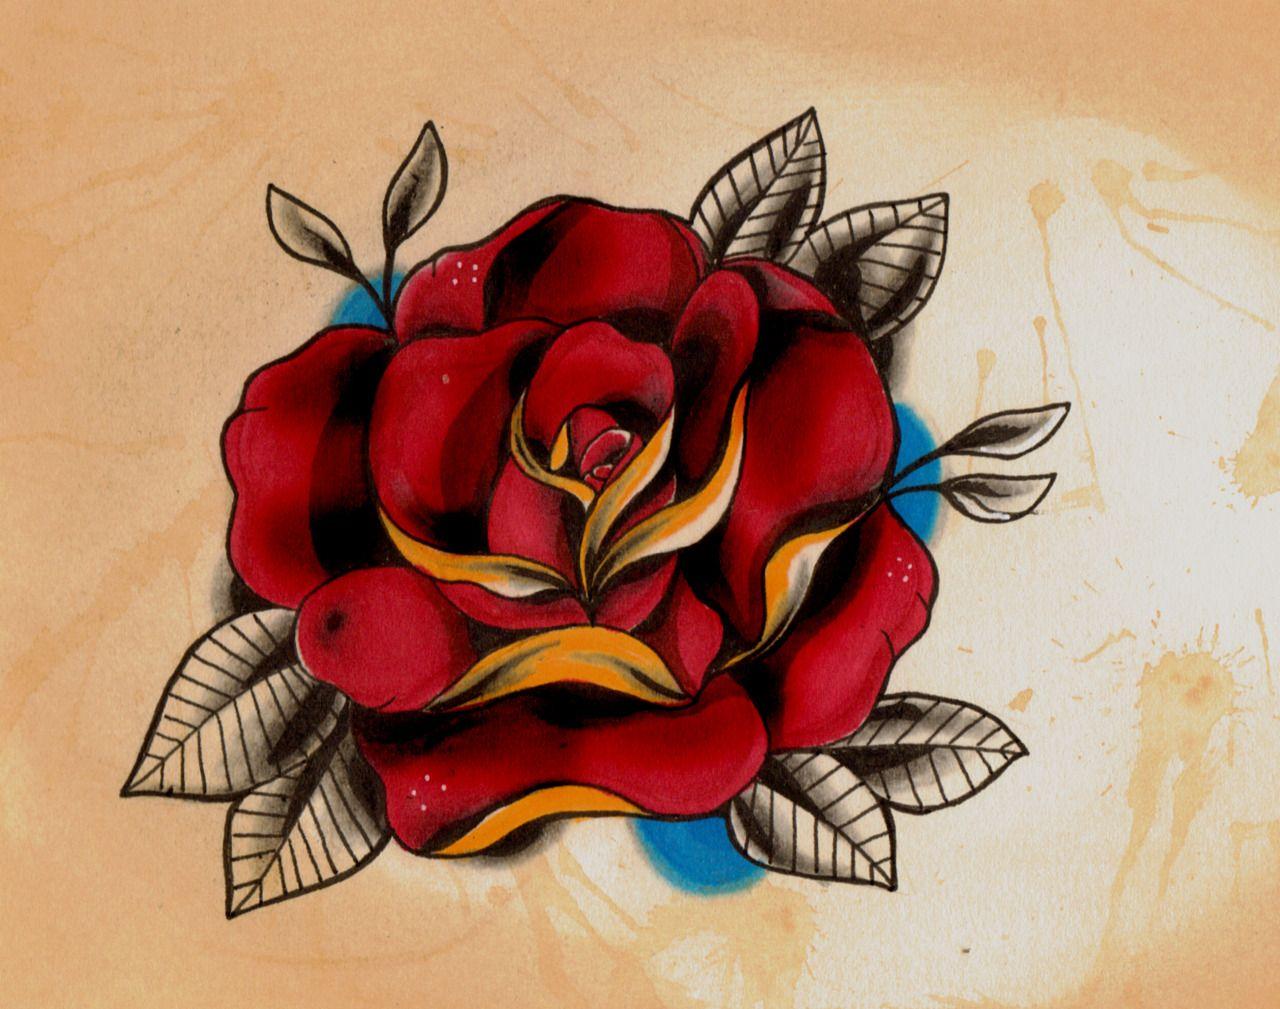 Old rose school designs photo foto